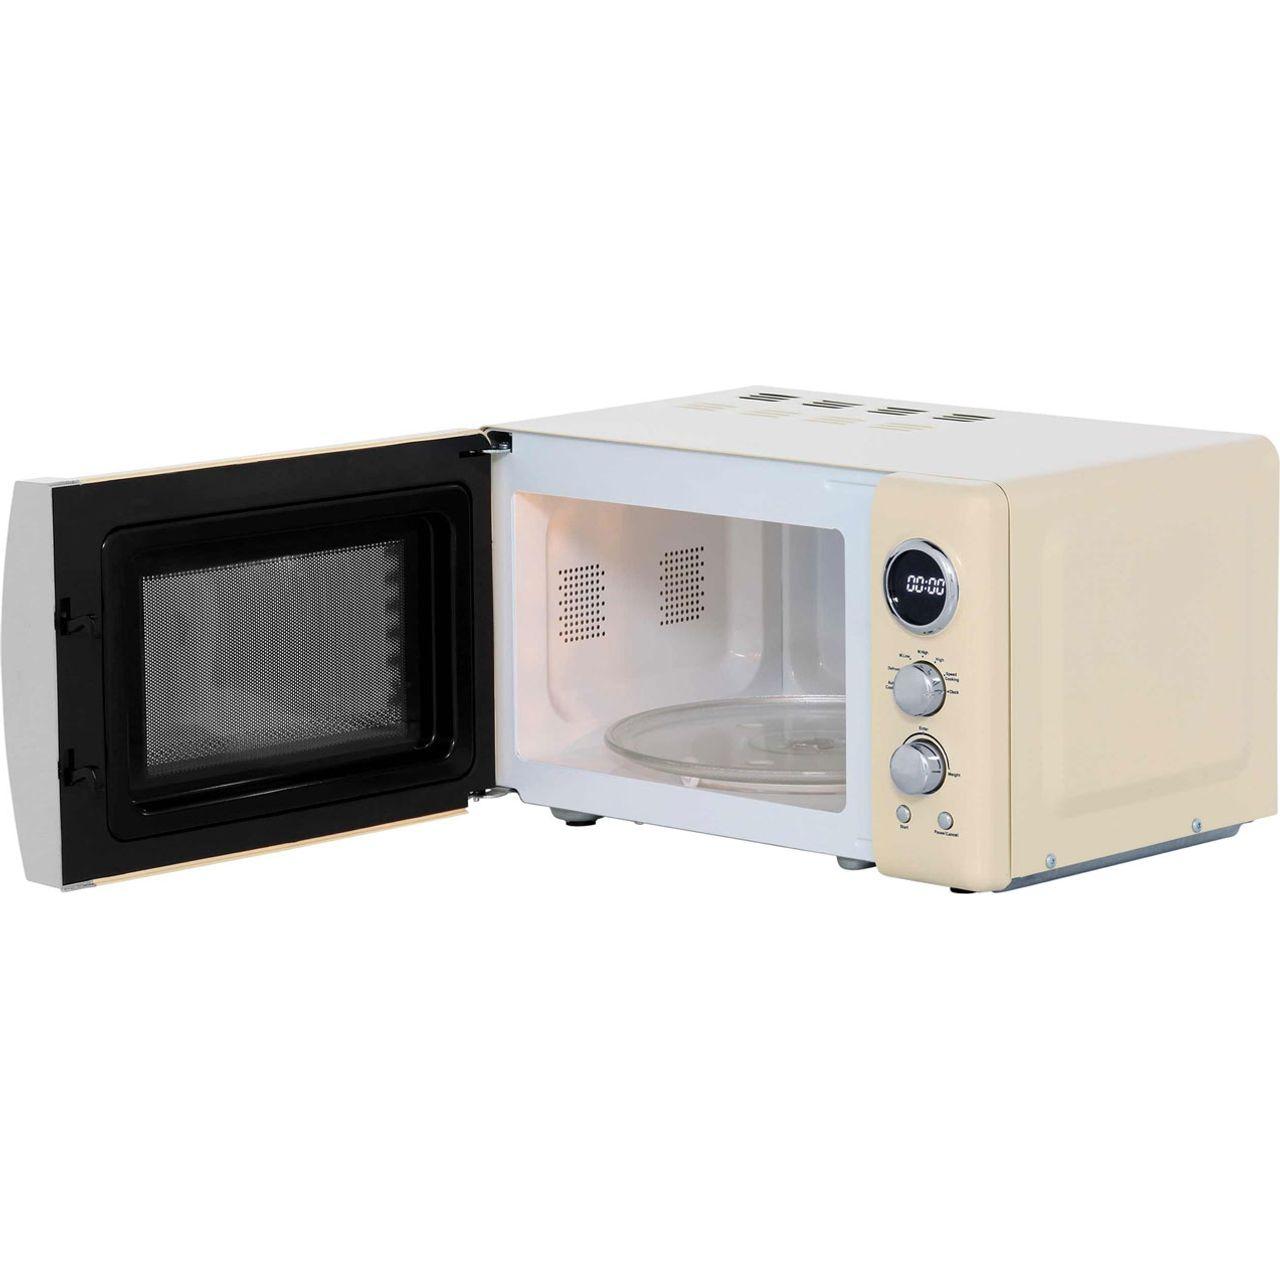 Cream Retro Microwave Ukbestmicrowave